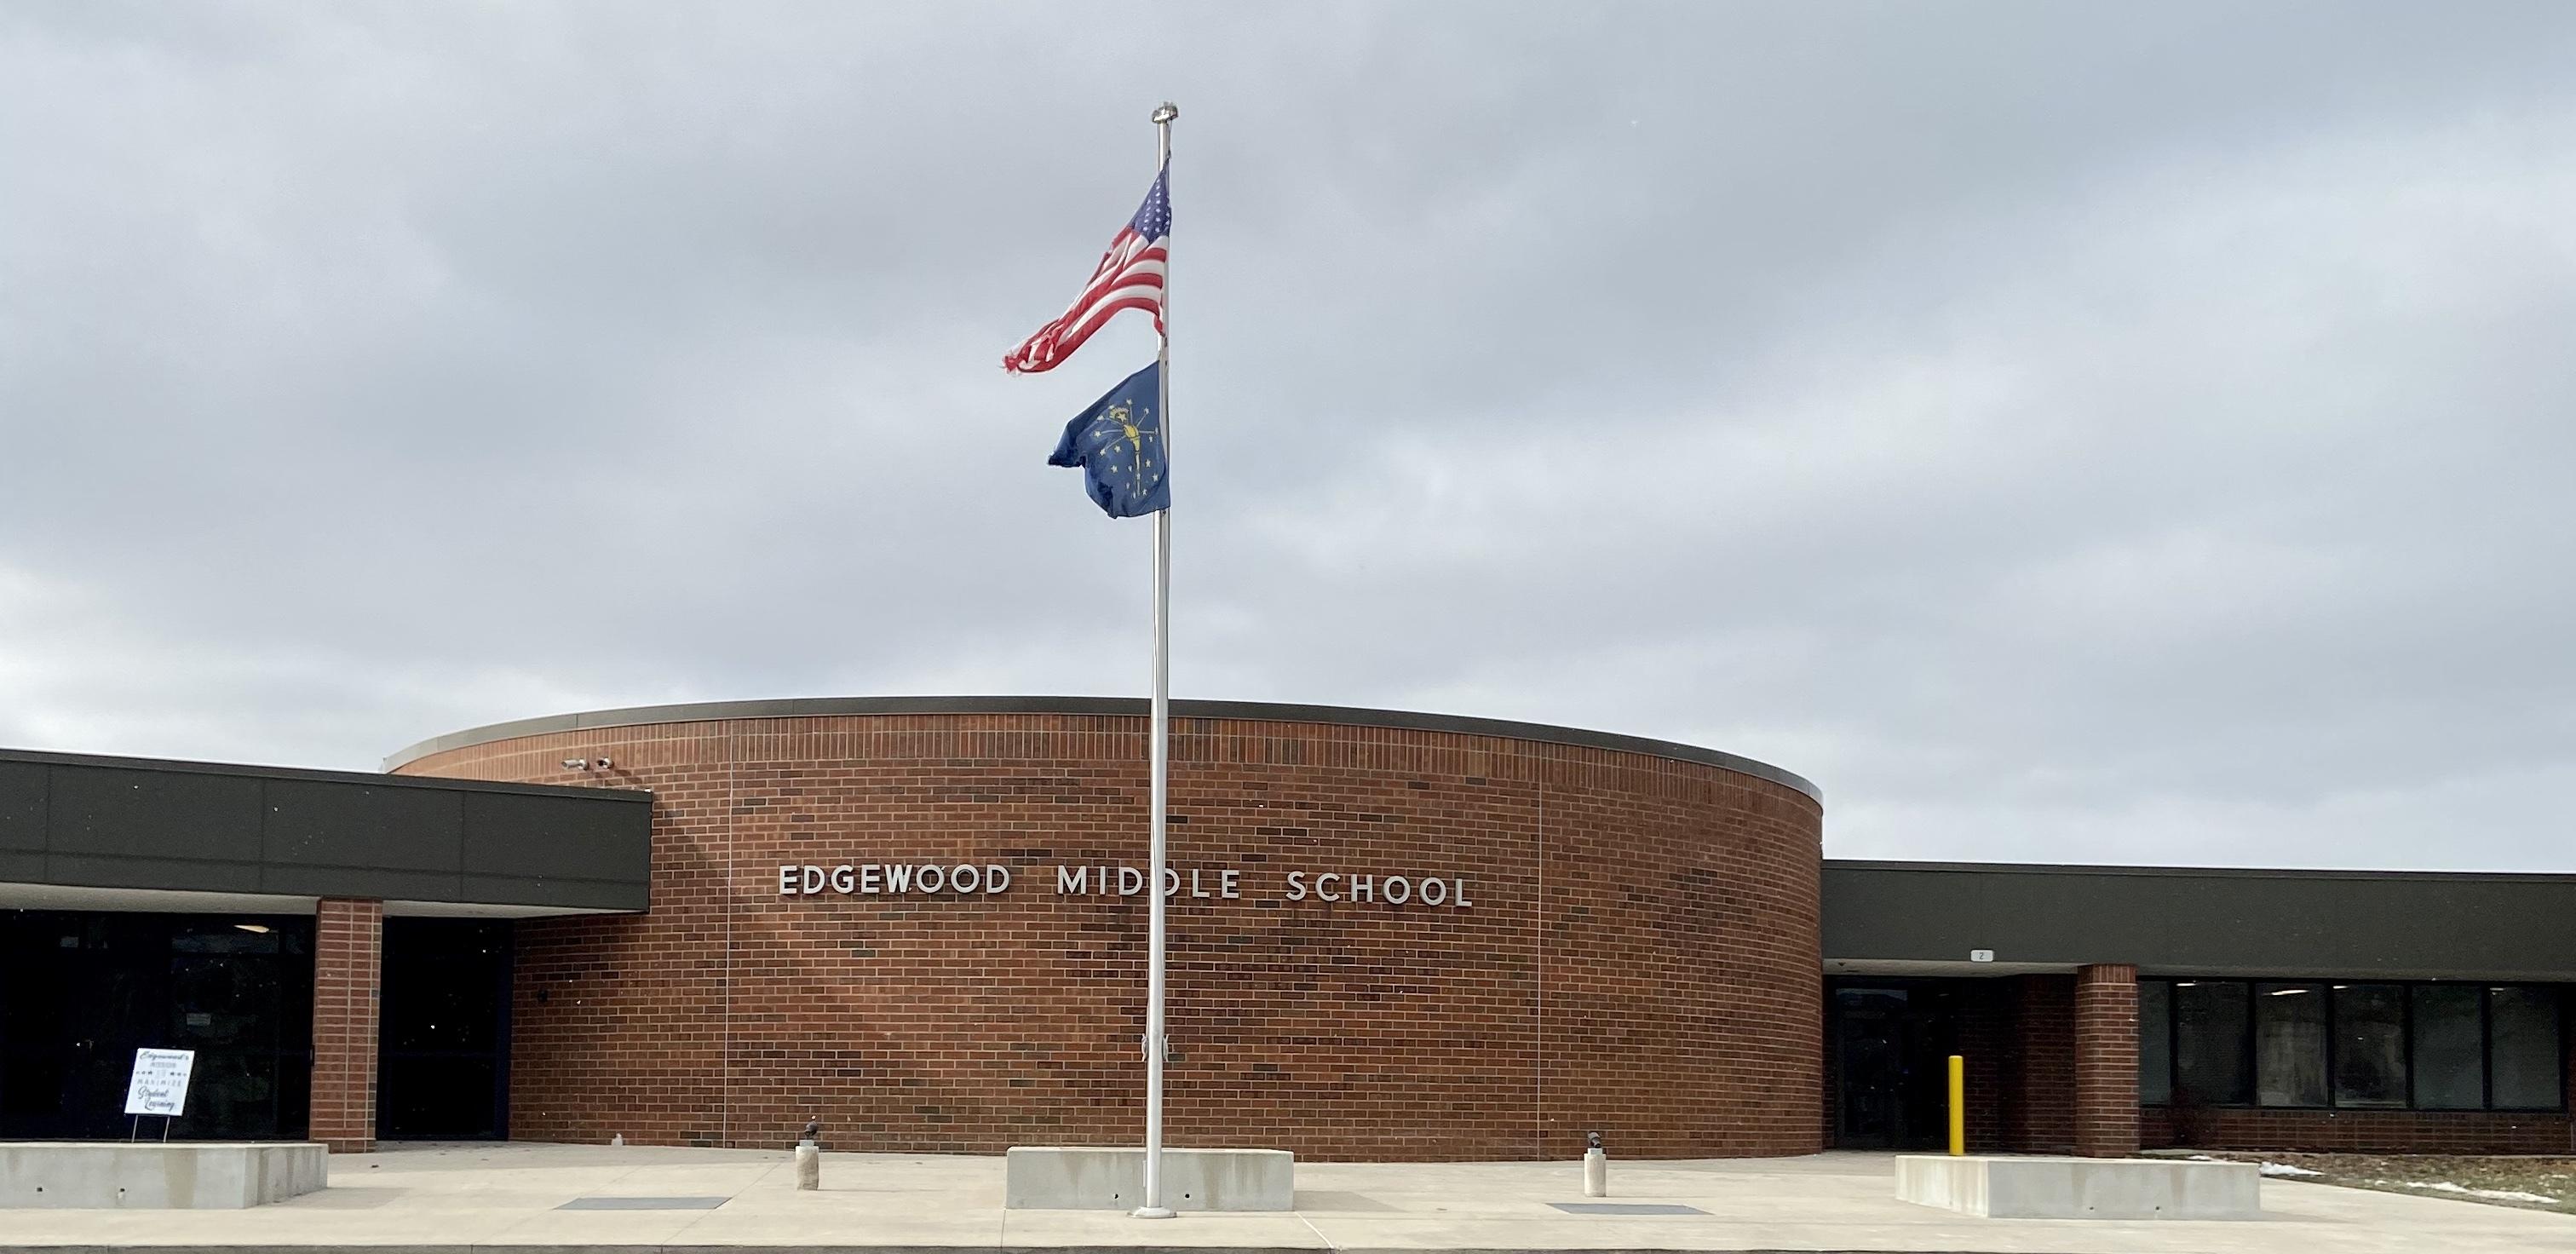 Edgewood Middle School